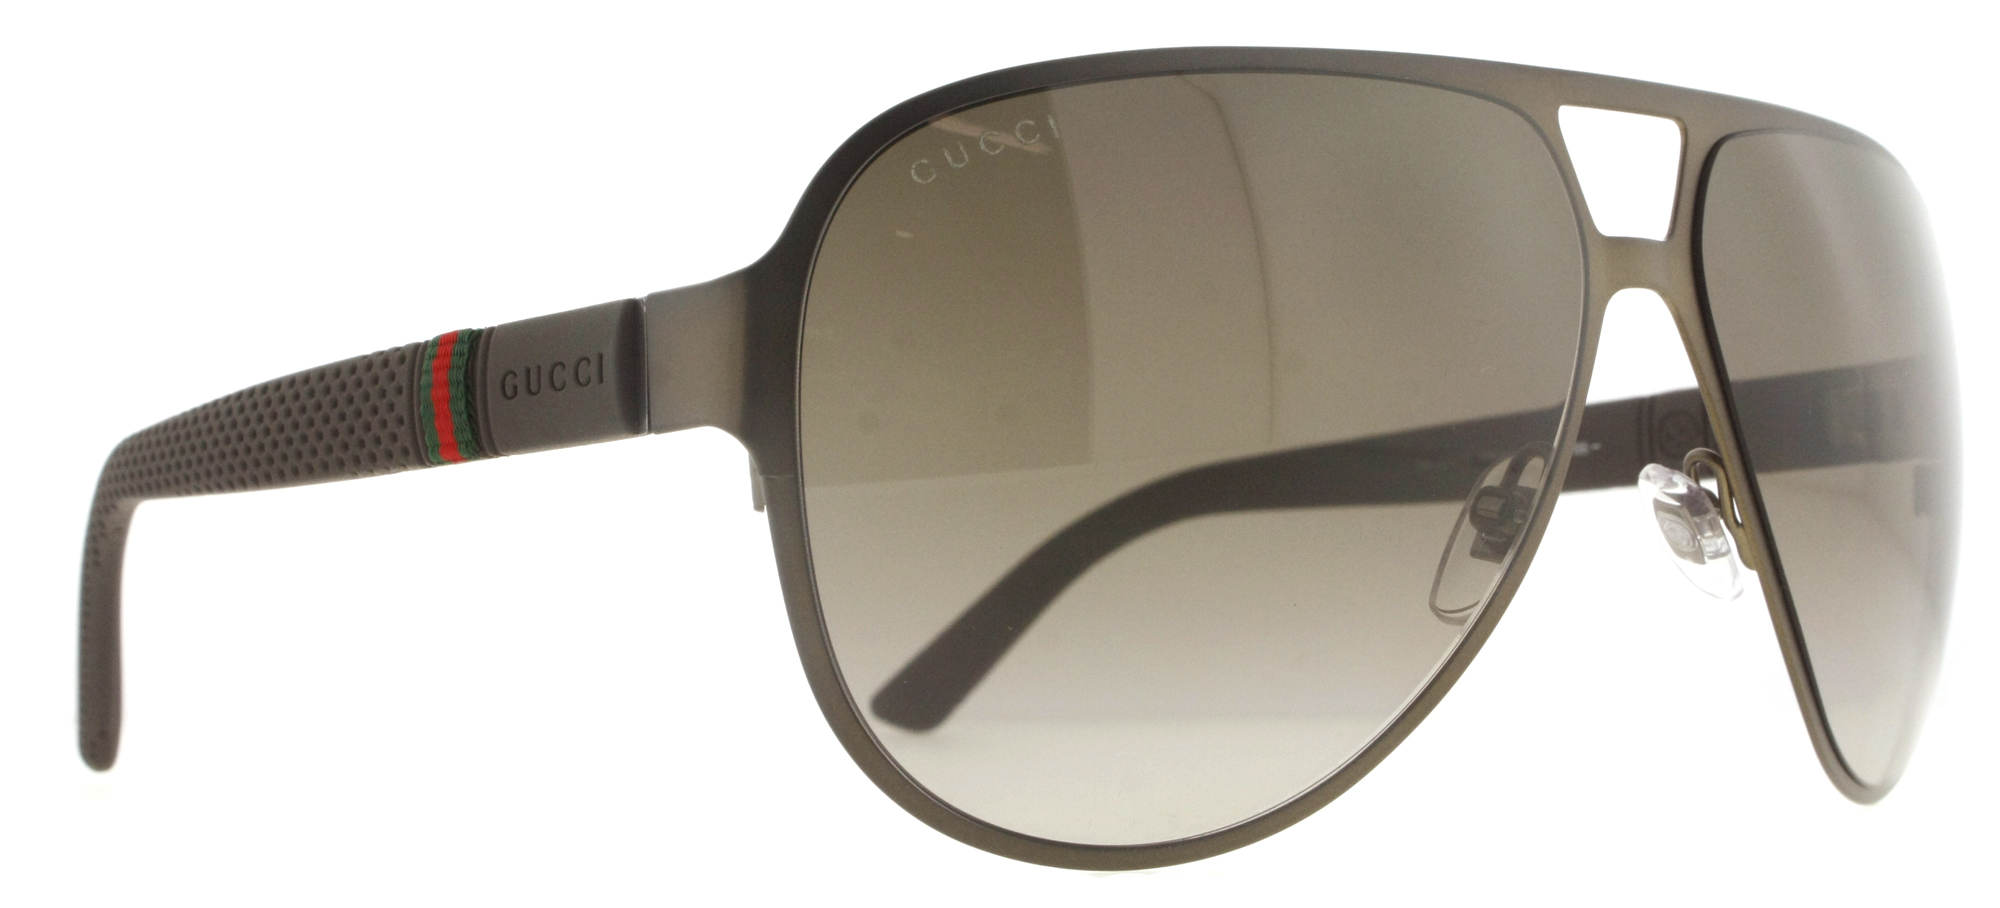 839098d2ec5 Gucci - Gucci GG 2252 S R42 HA Matte Brown Brown Gradient Aviator Men s  Sunglasses - Walmart.com